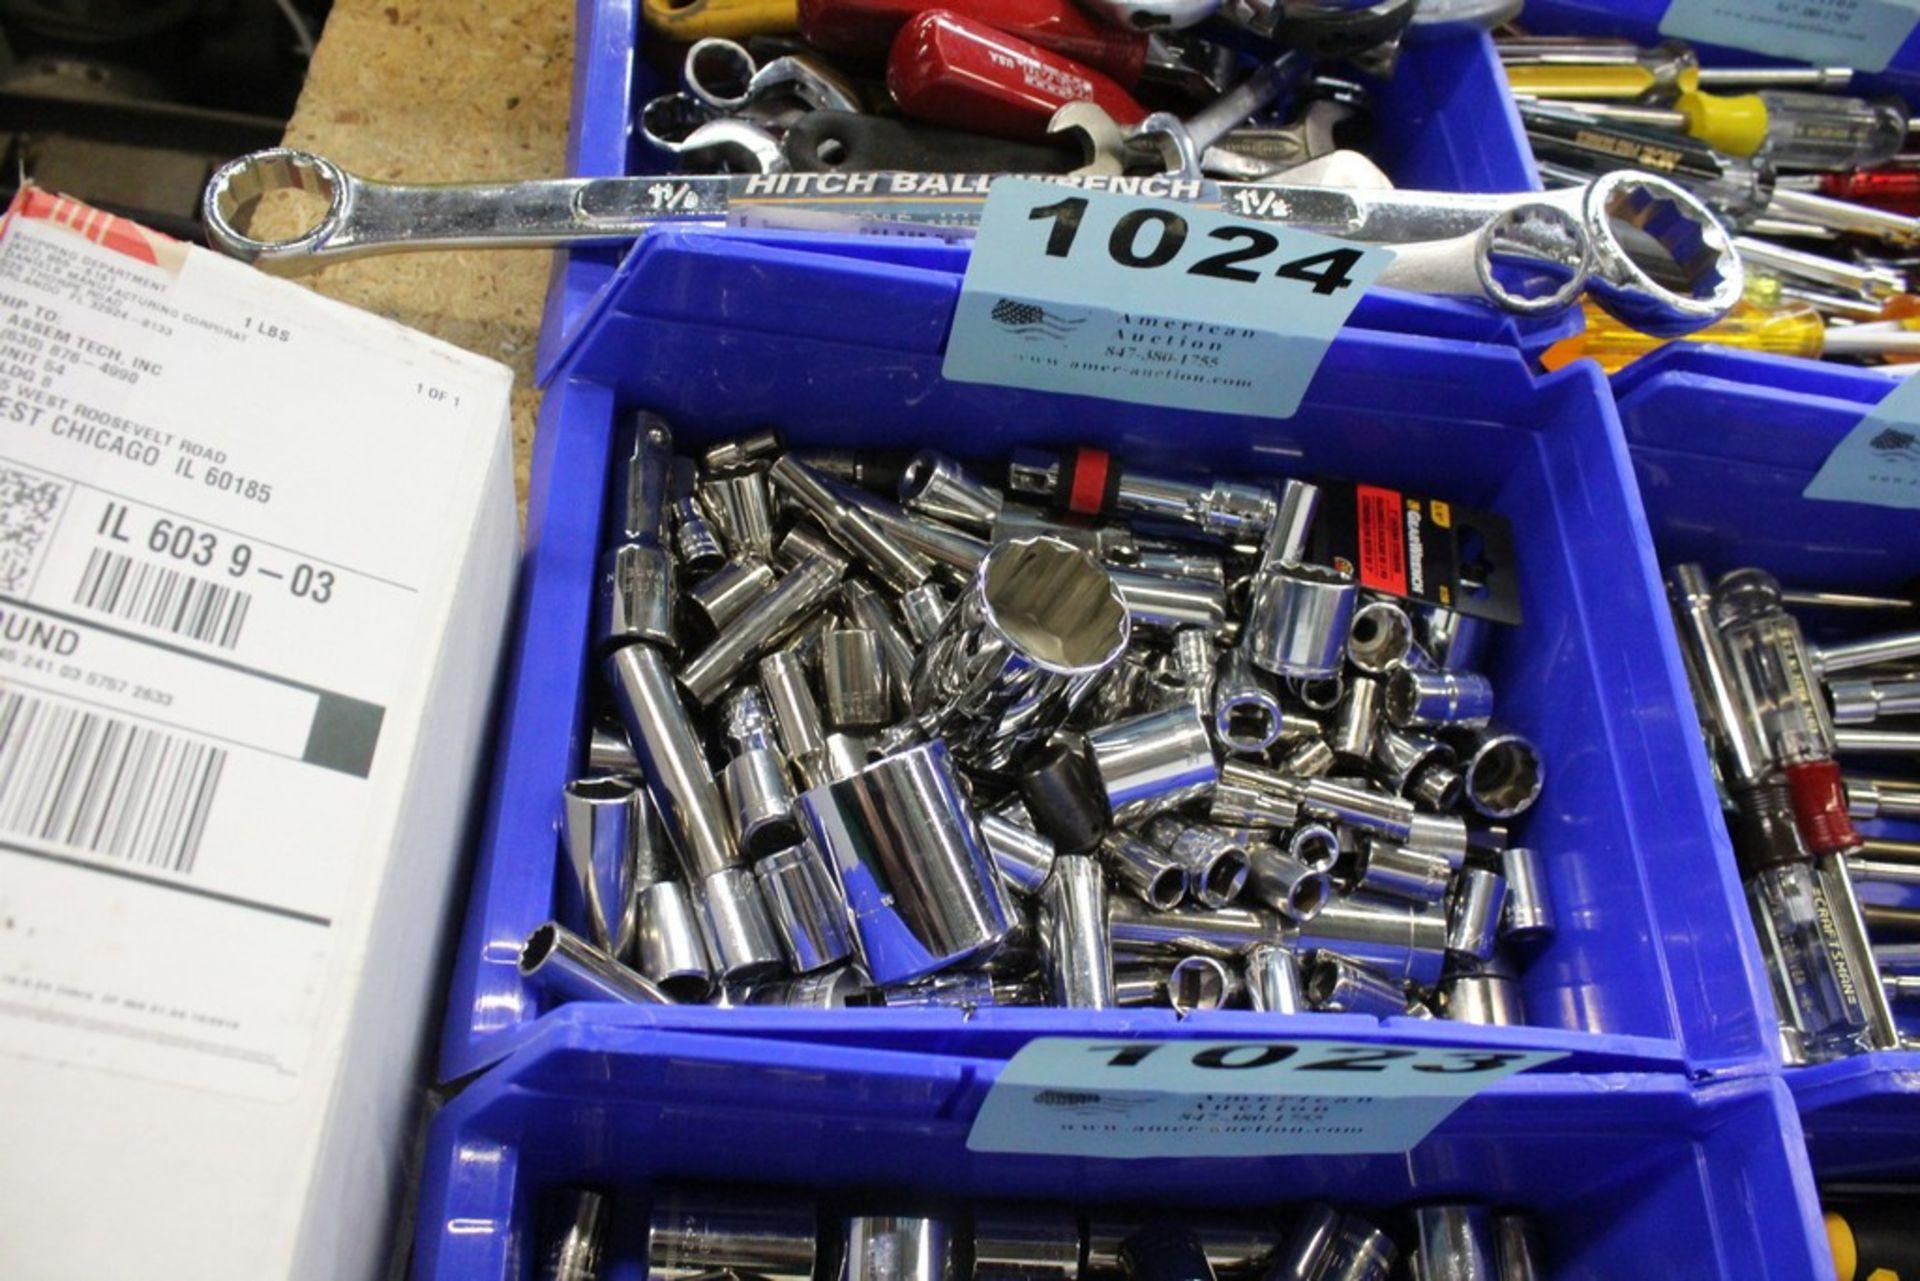 Lot 1024 - ASSORTED STANDARD SOCKETS